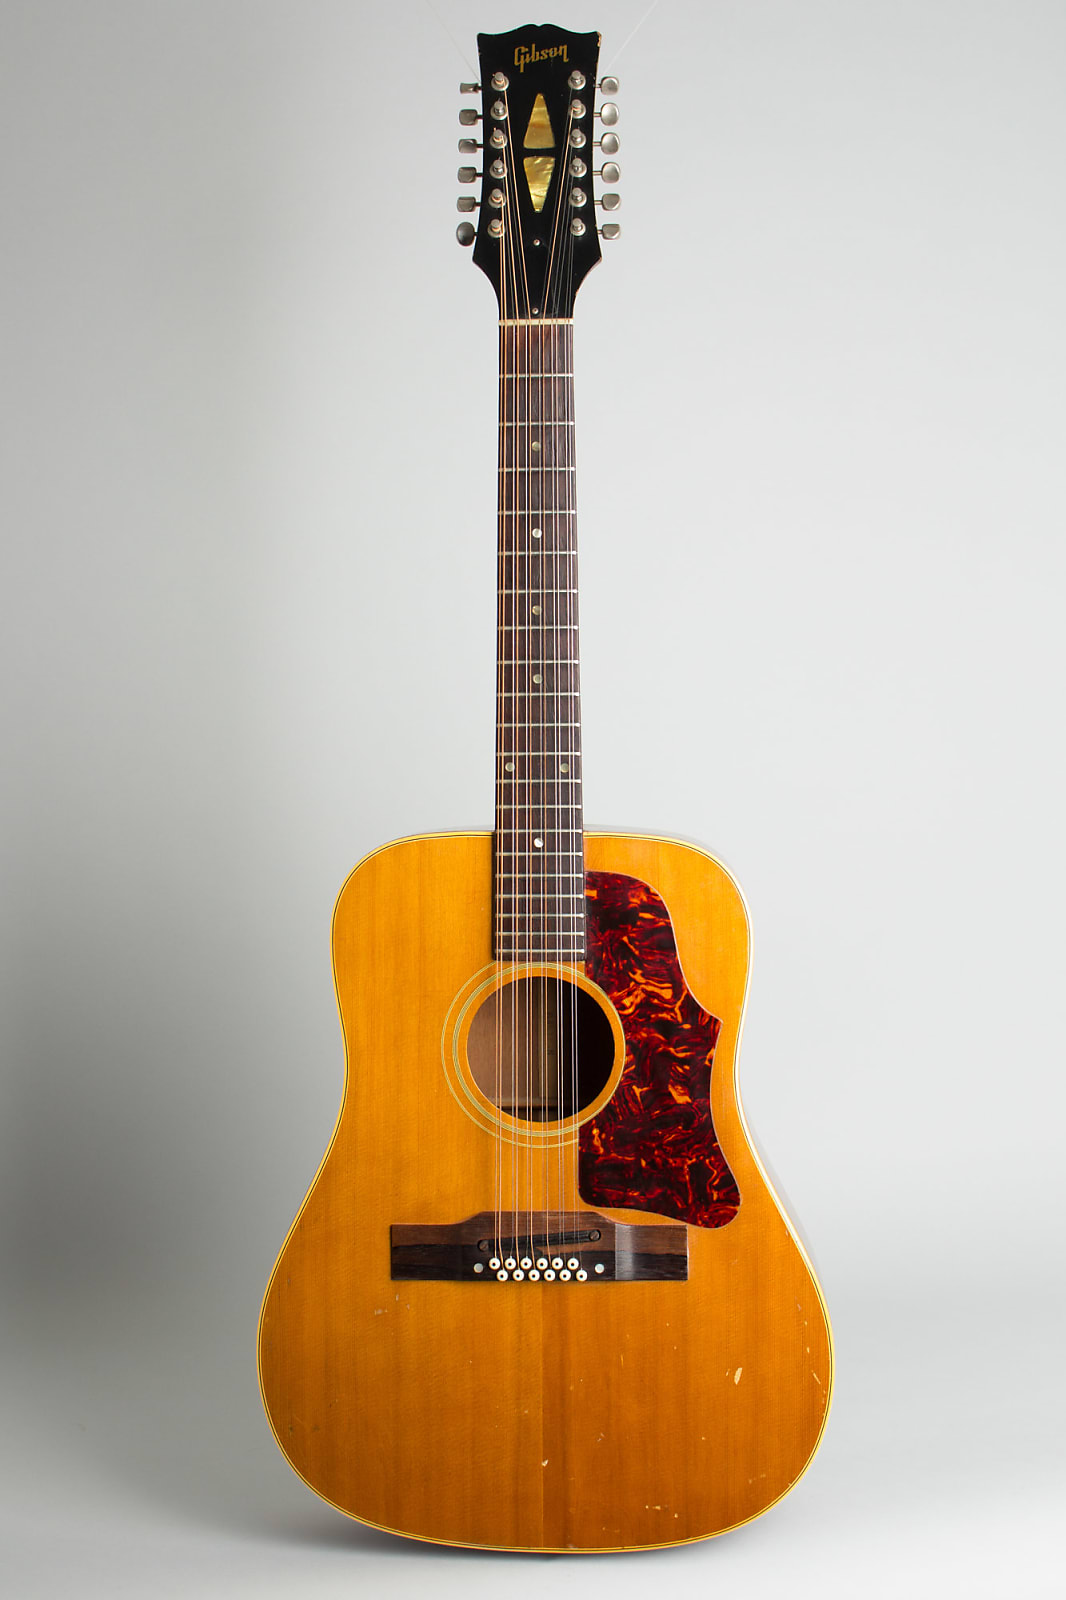 Gibson  B-45-12N 12 String Flat Top Acoustic Guitar (1964), ser. #193998, black hard shell case.